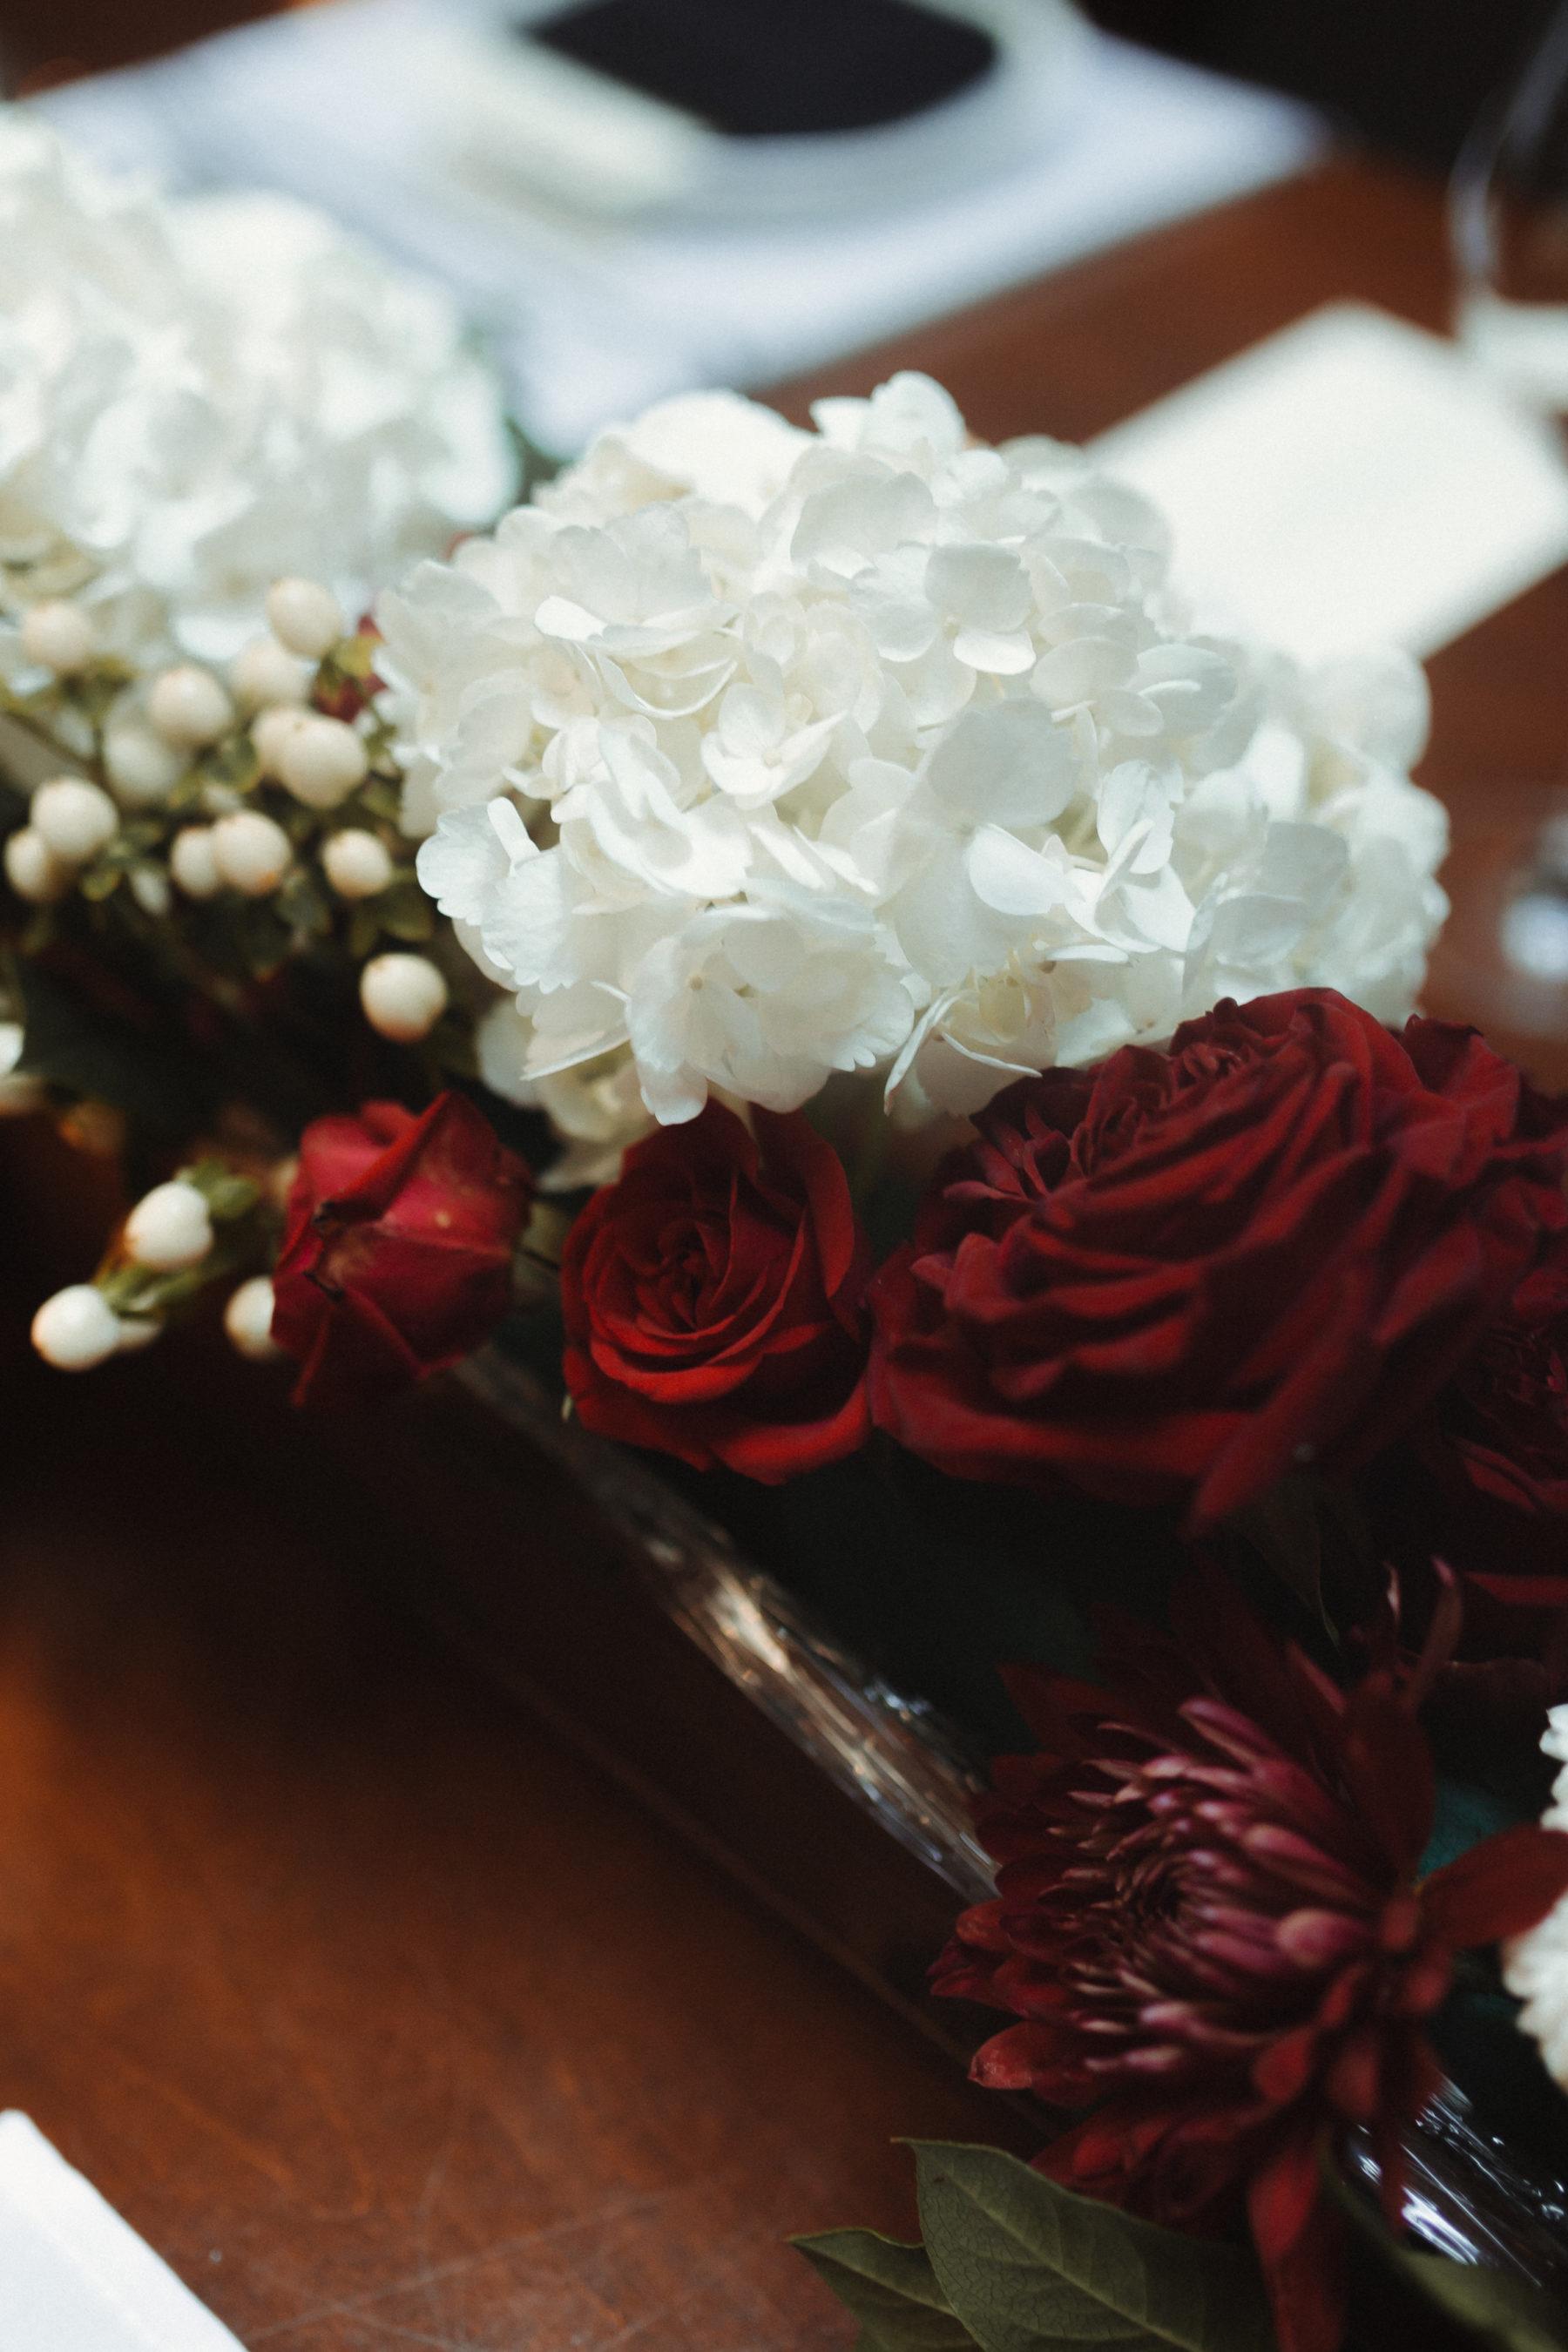 Red and white wedding flowers; Nashville brunch elopement featured on Nashville Bride Guide